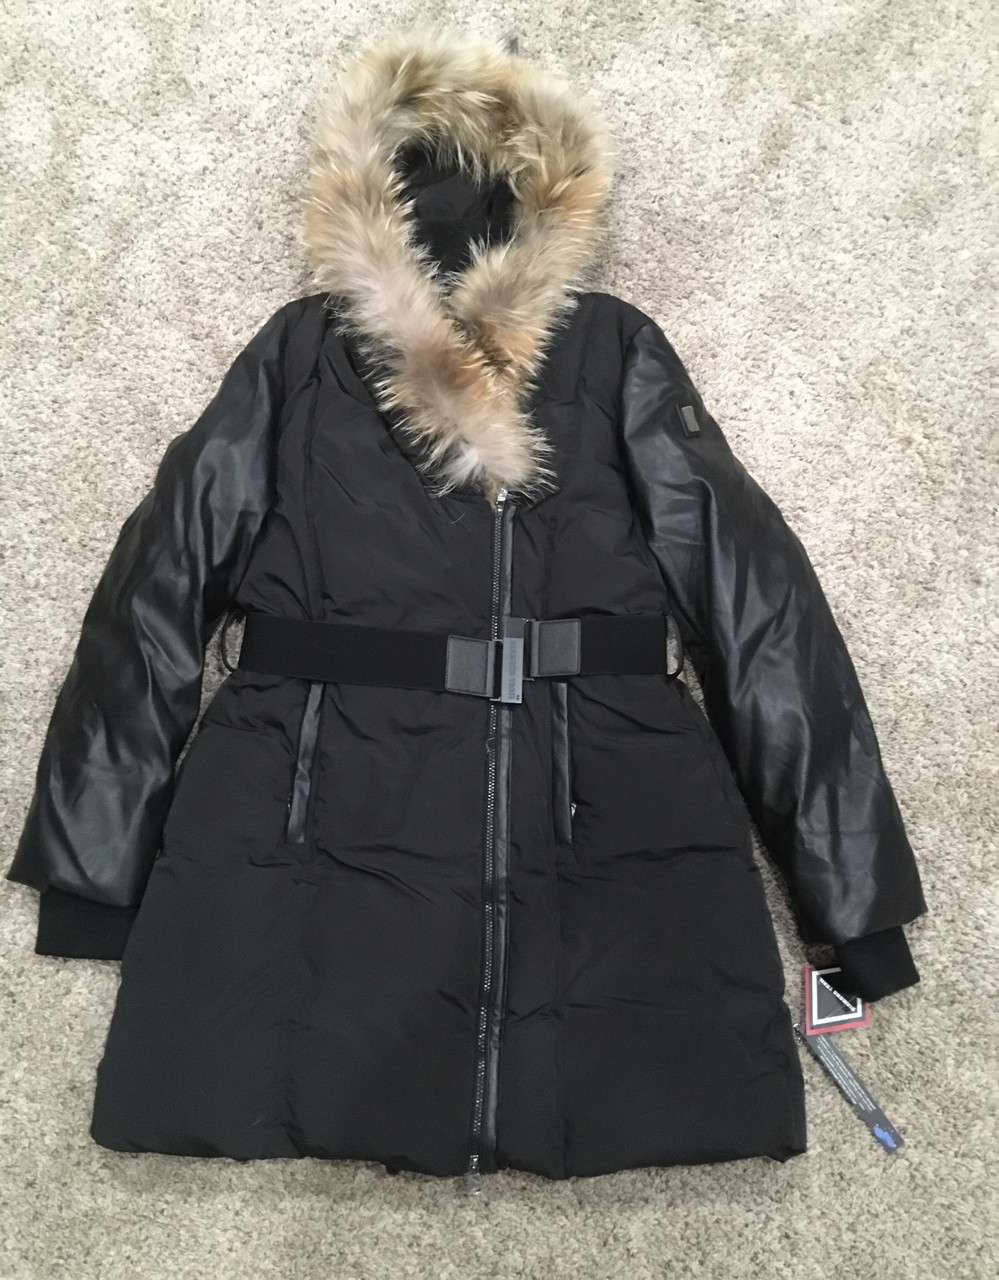 Ladies Diamond Trail Winter Coat, Size XL